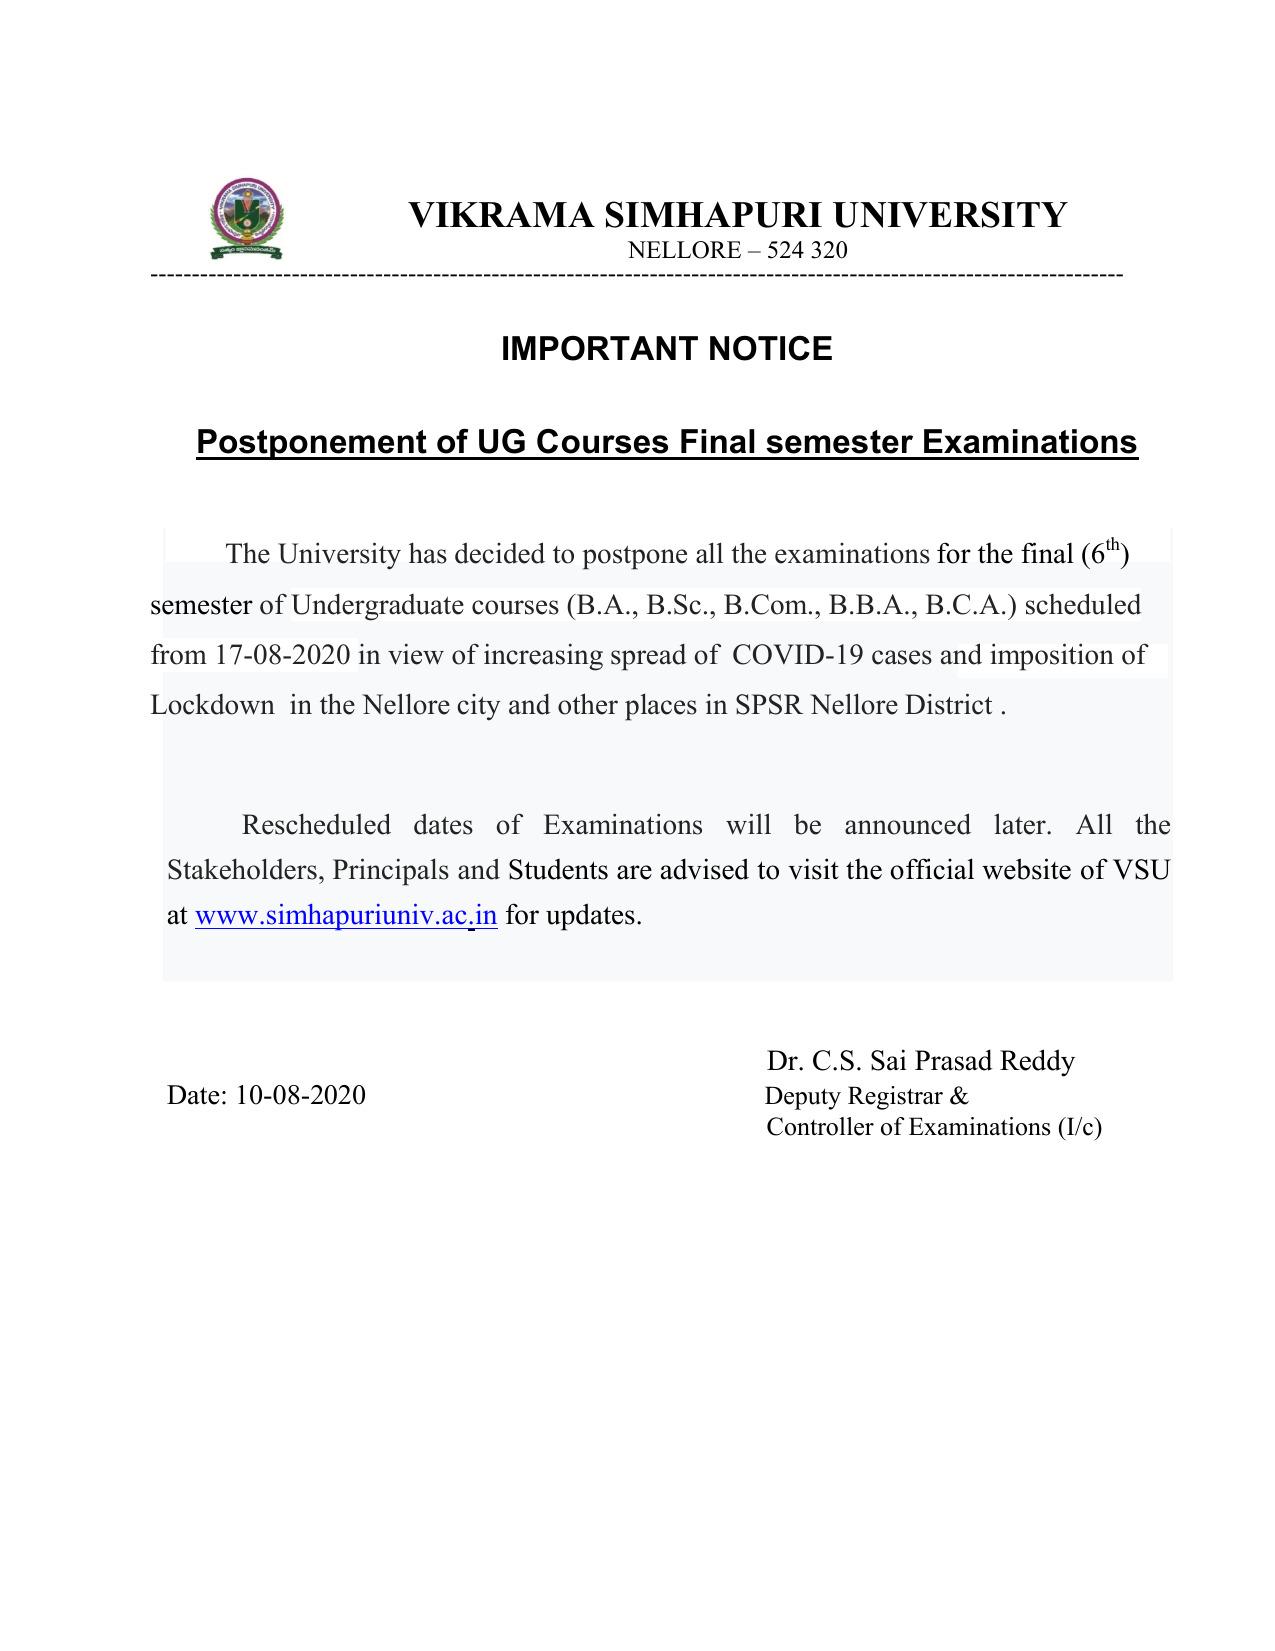 Vikrama Simhapuri University UG Course Final Semeter 2020 Exam Postponed Notification